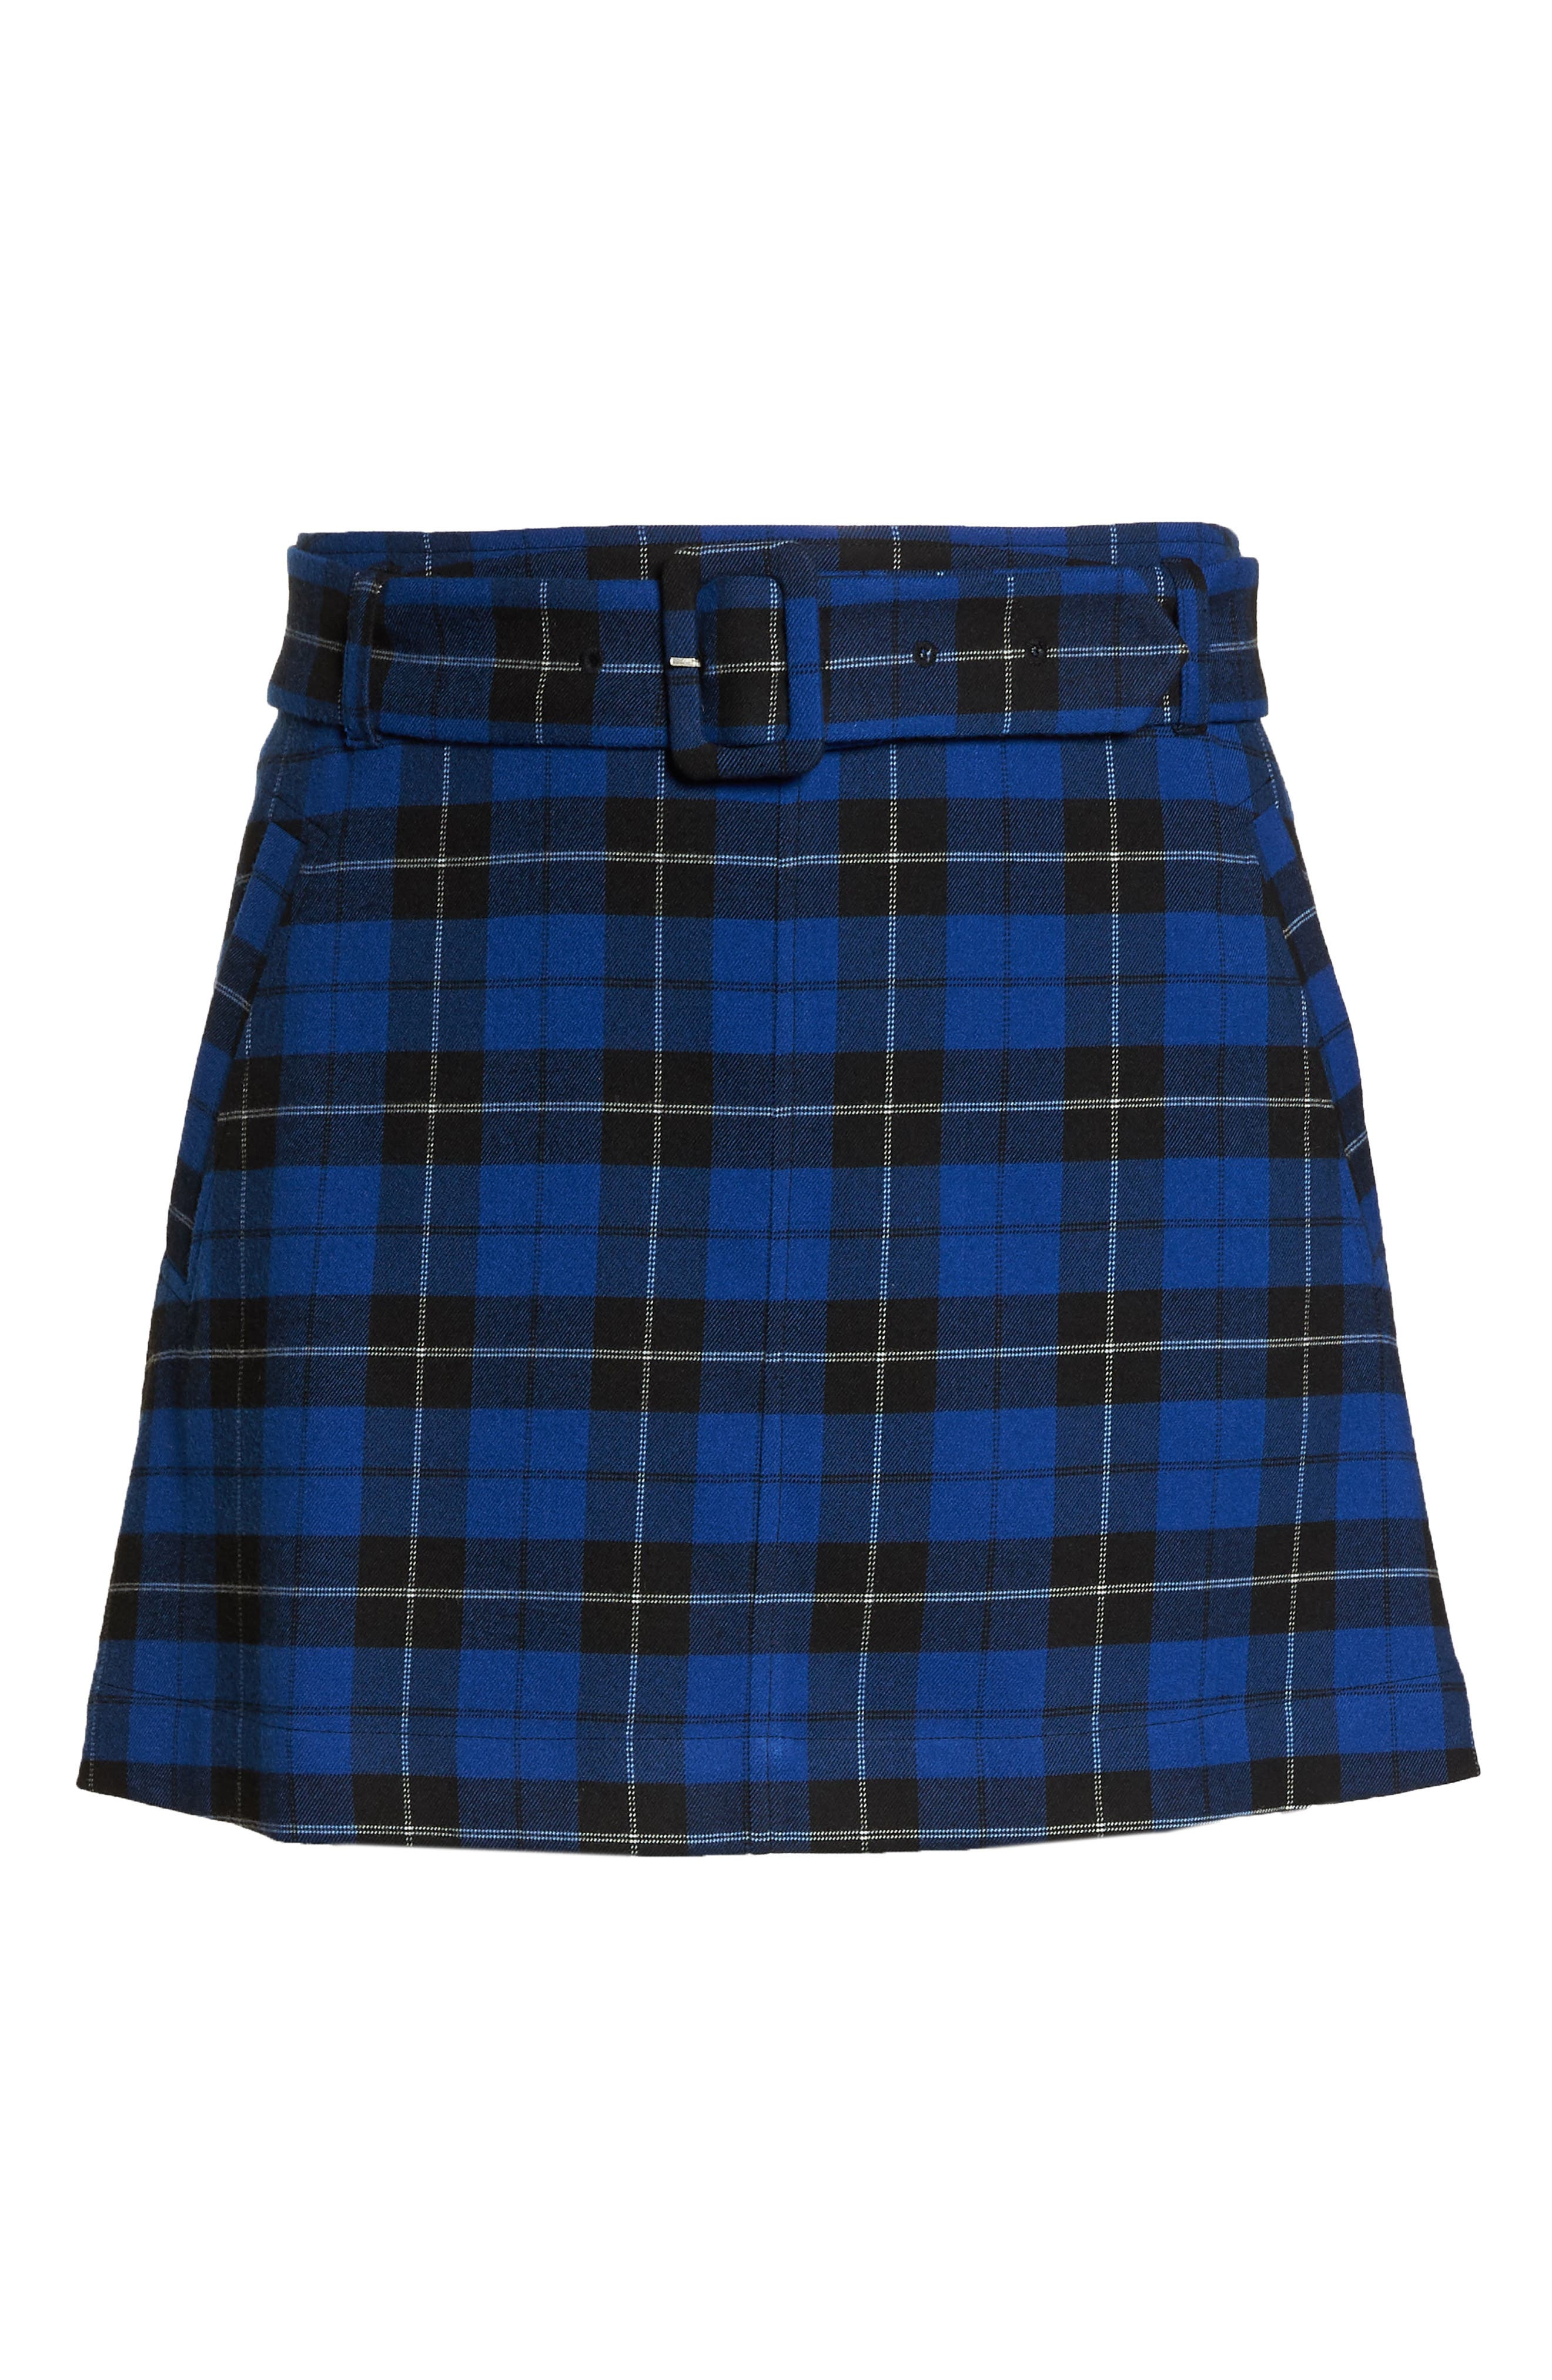 Belted Plaid Skirt,                             Alternate thumbnail 11, color,                             420